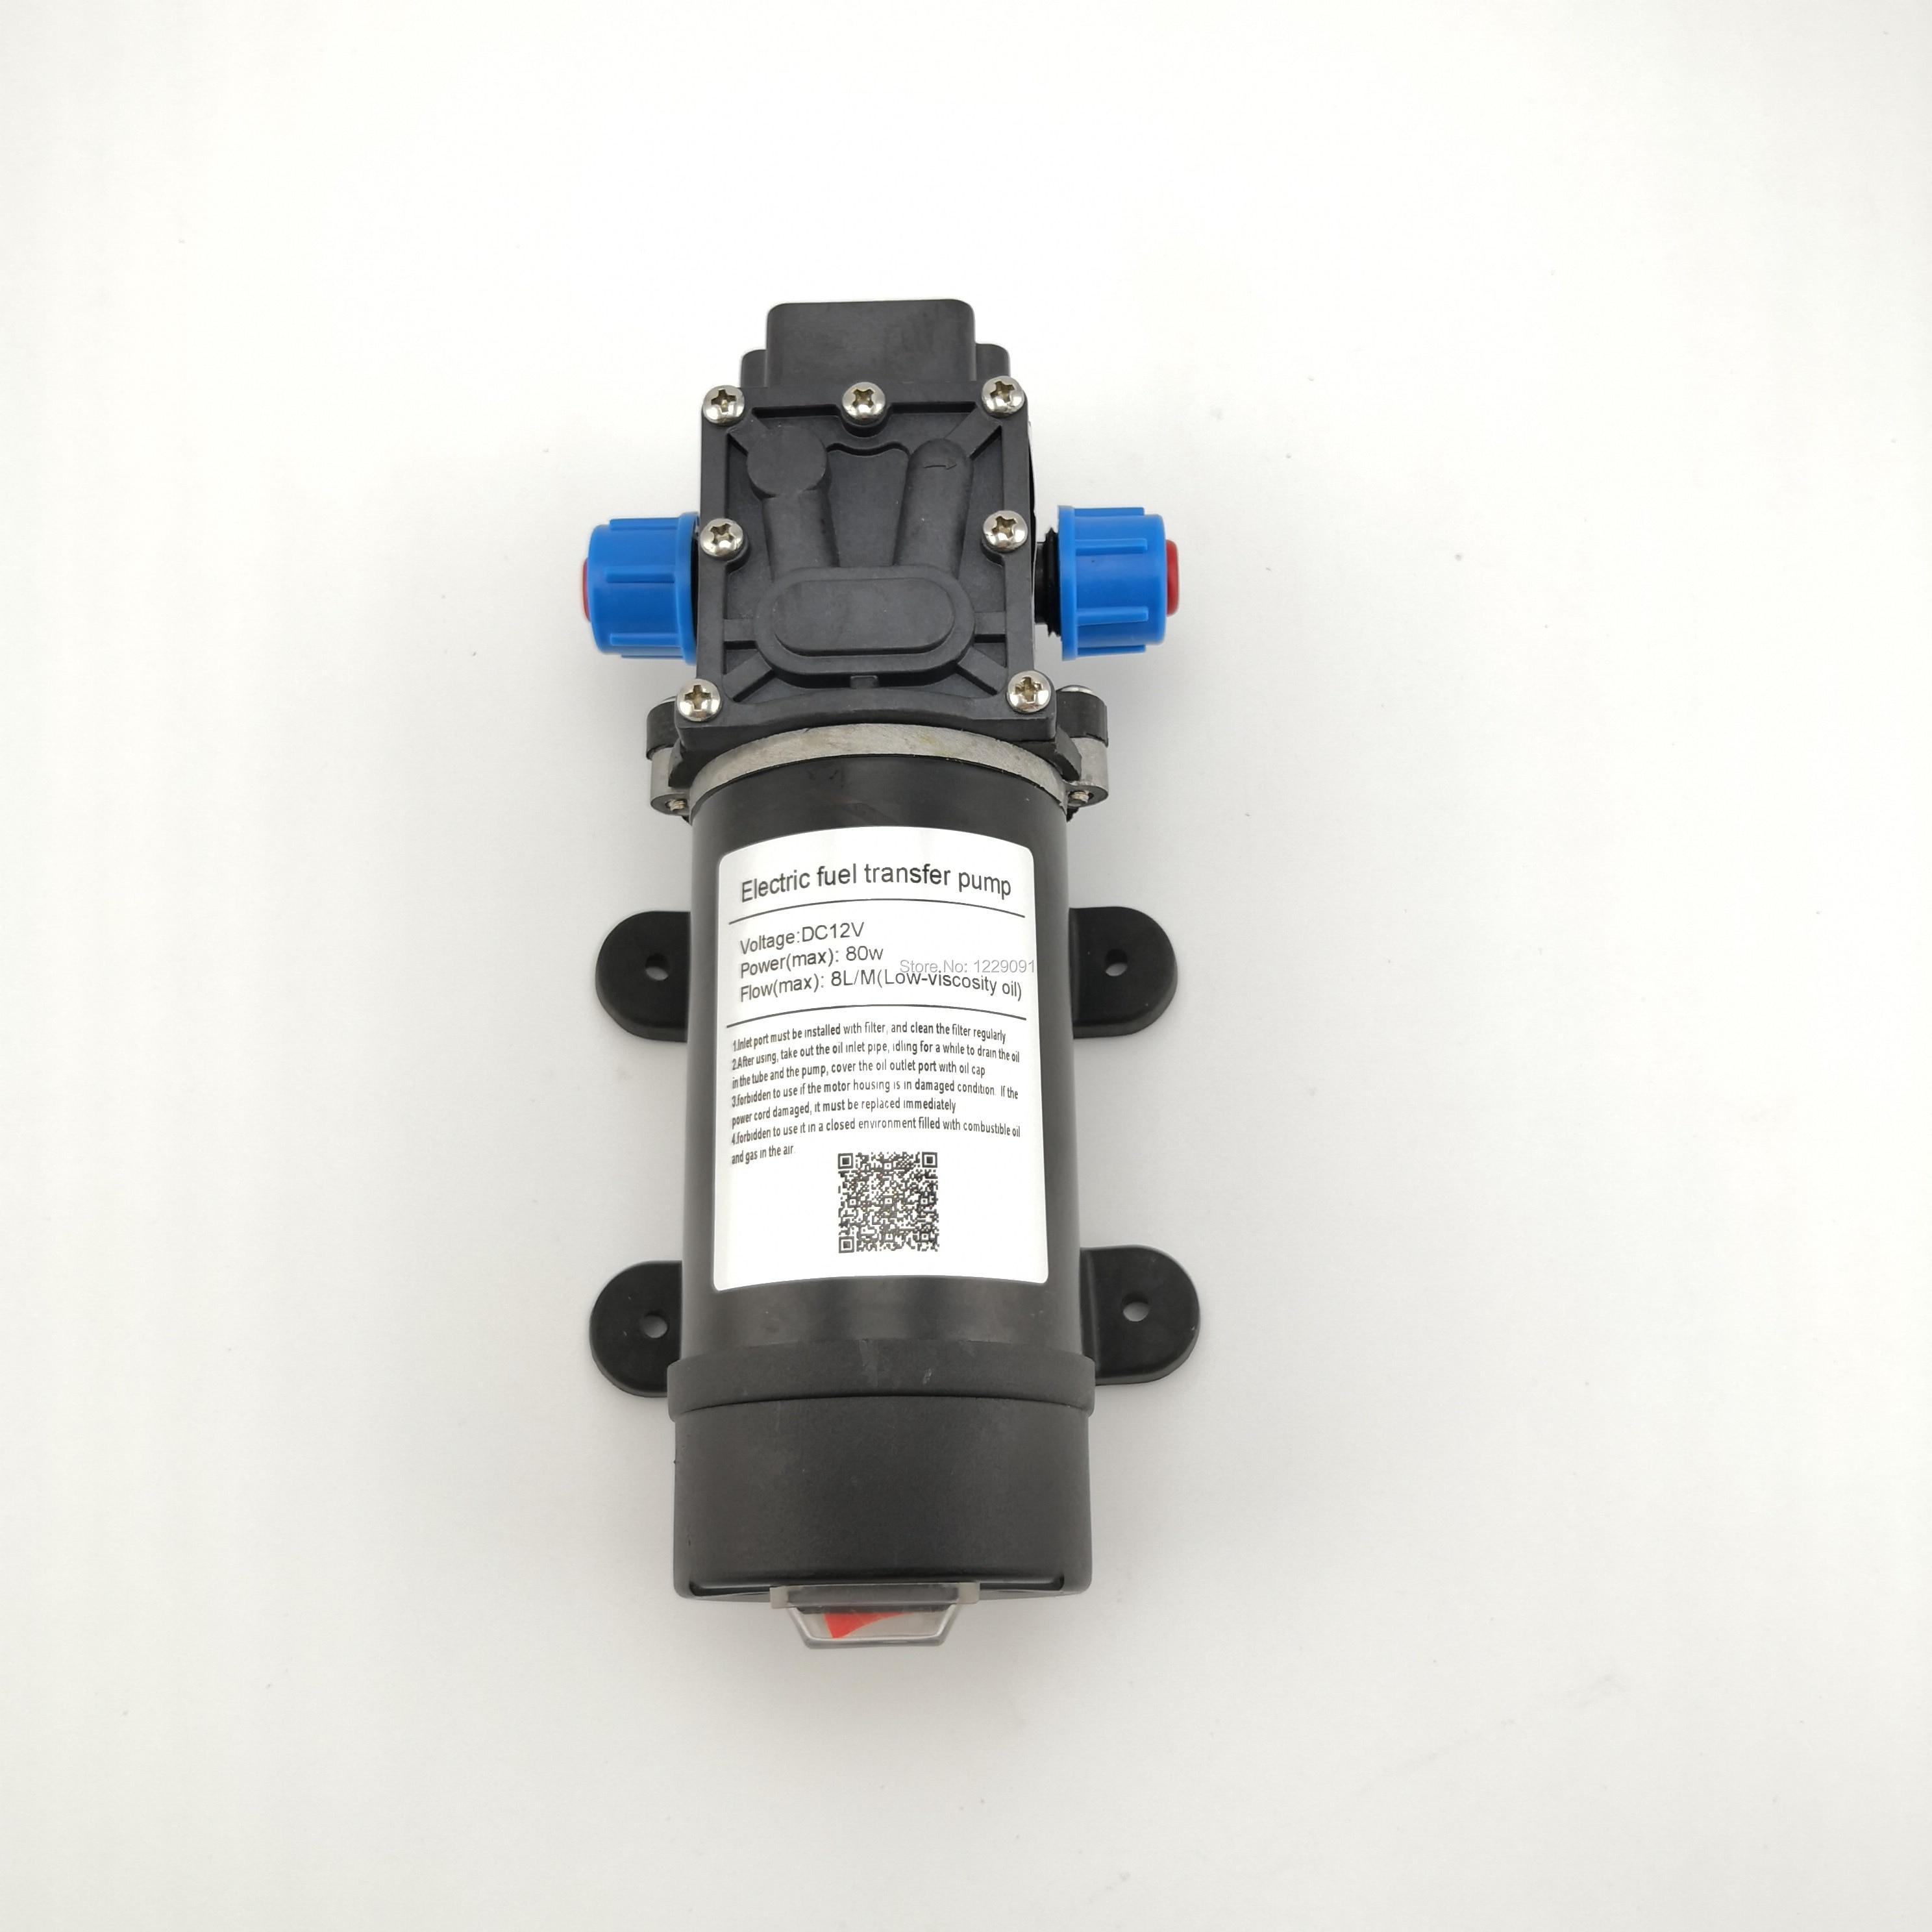 80w 8LPM small electric self priming Fuel Transfer Pump 12V and 24V Diesel gasoline kerosene Oil Transfer Refueling